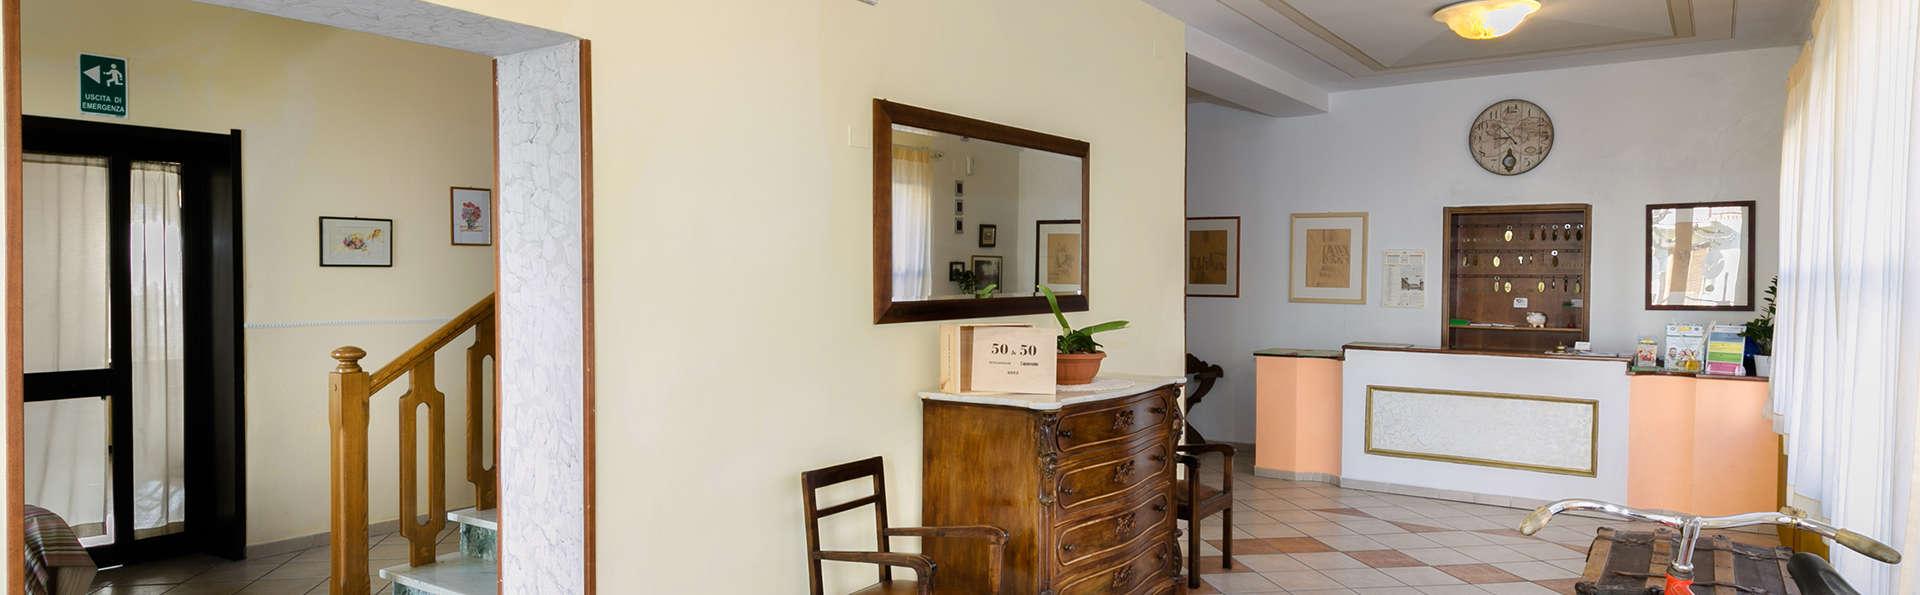 Hotel Nobile - Edit_Reception2.jpg